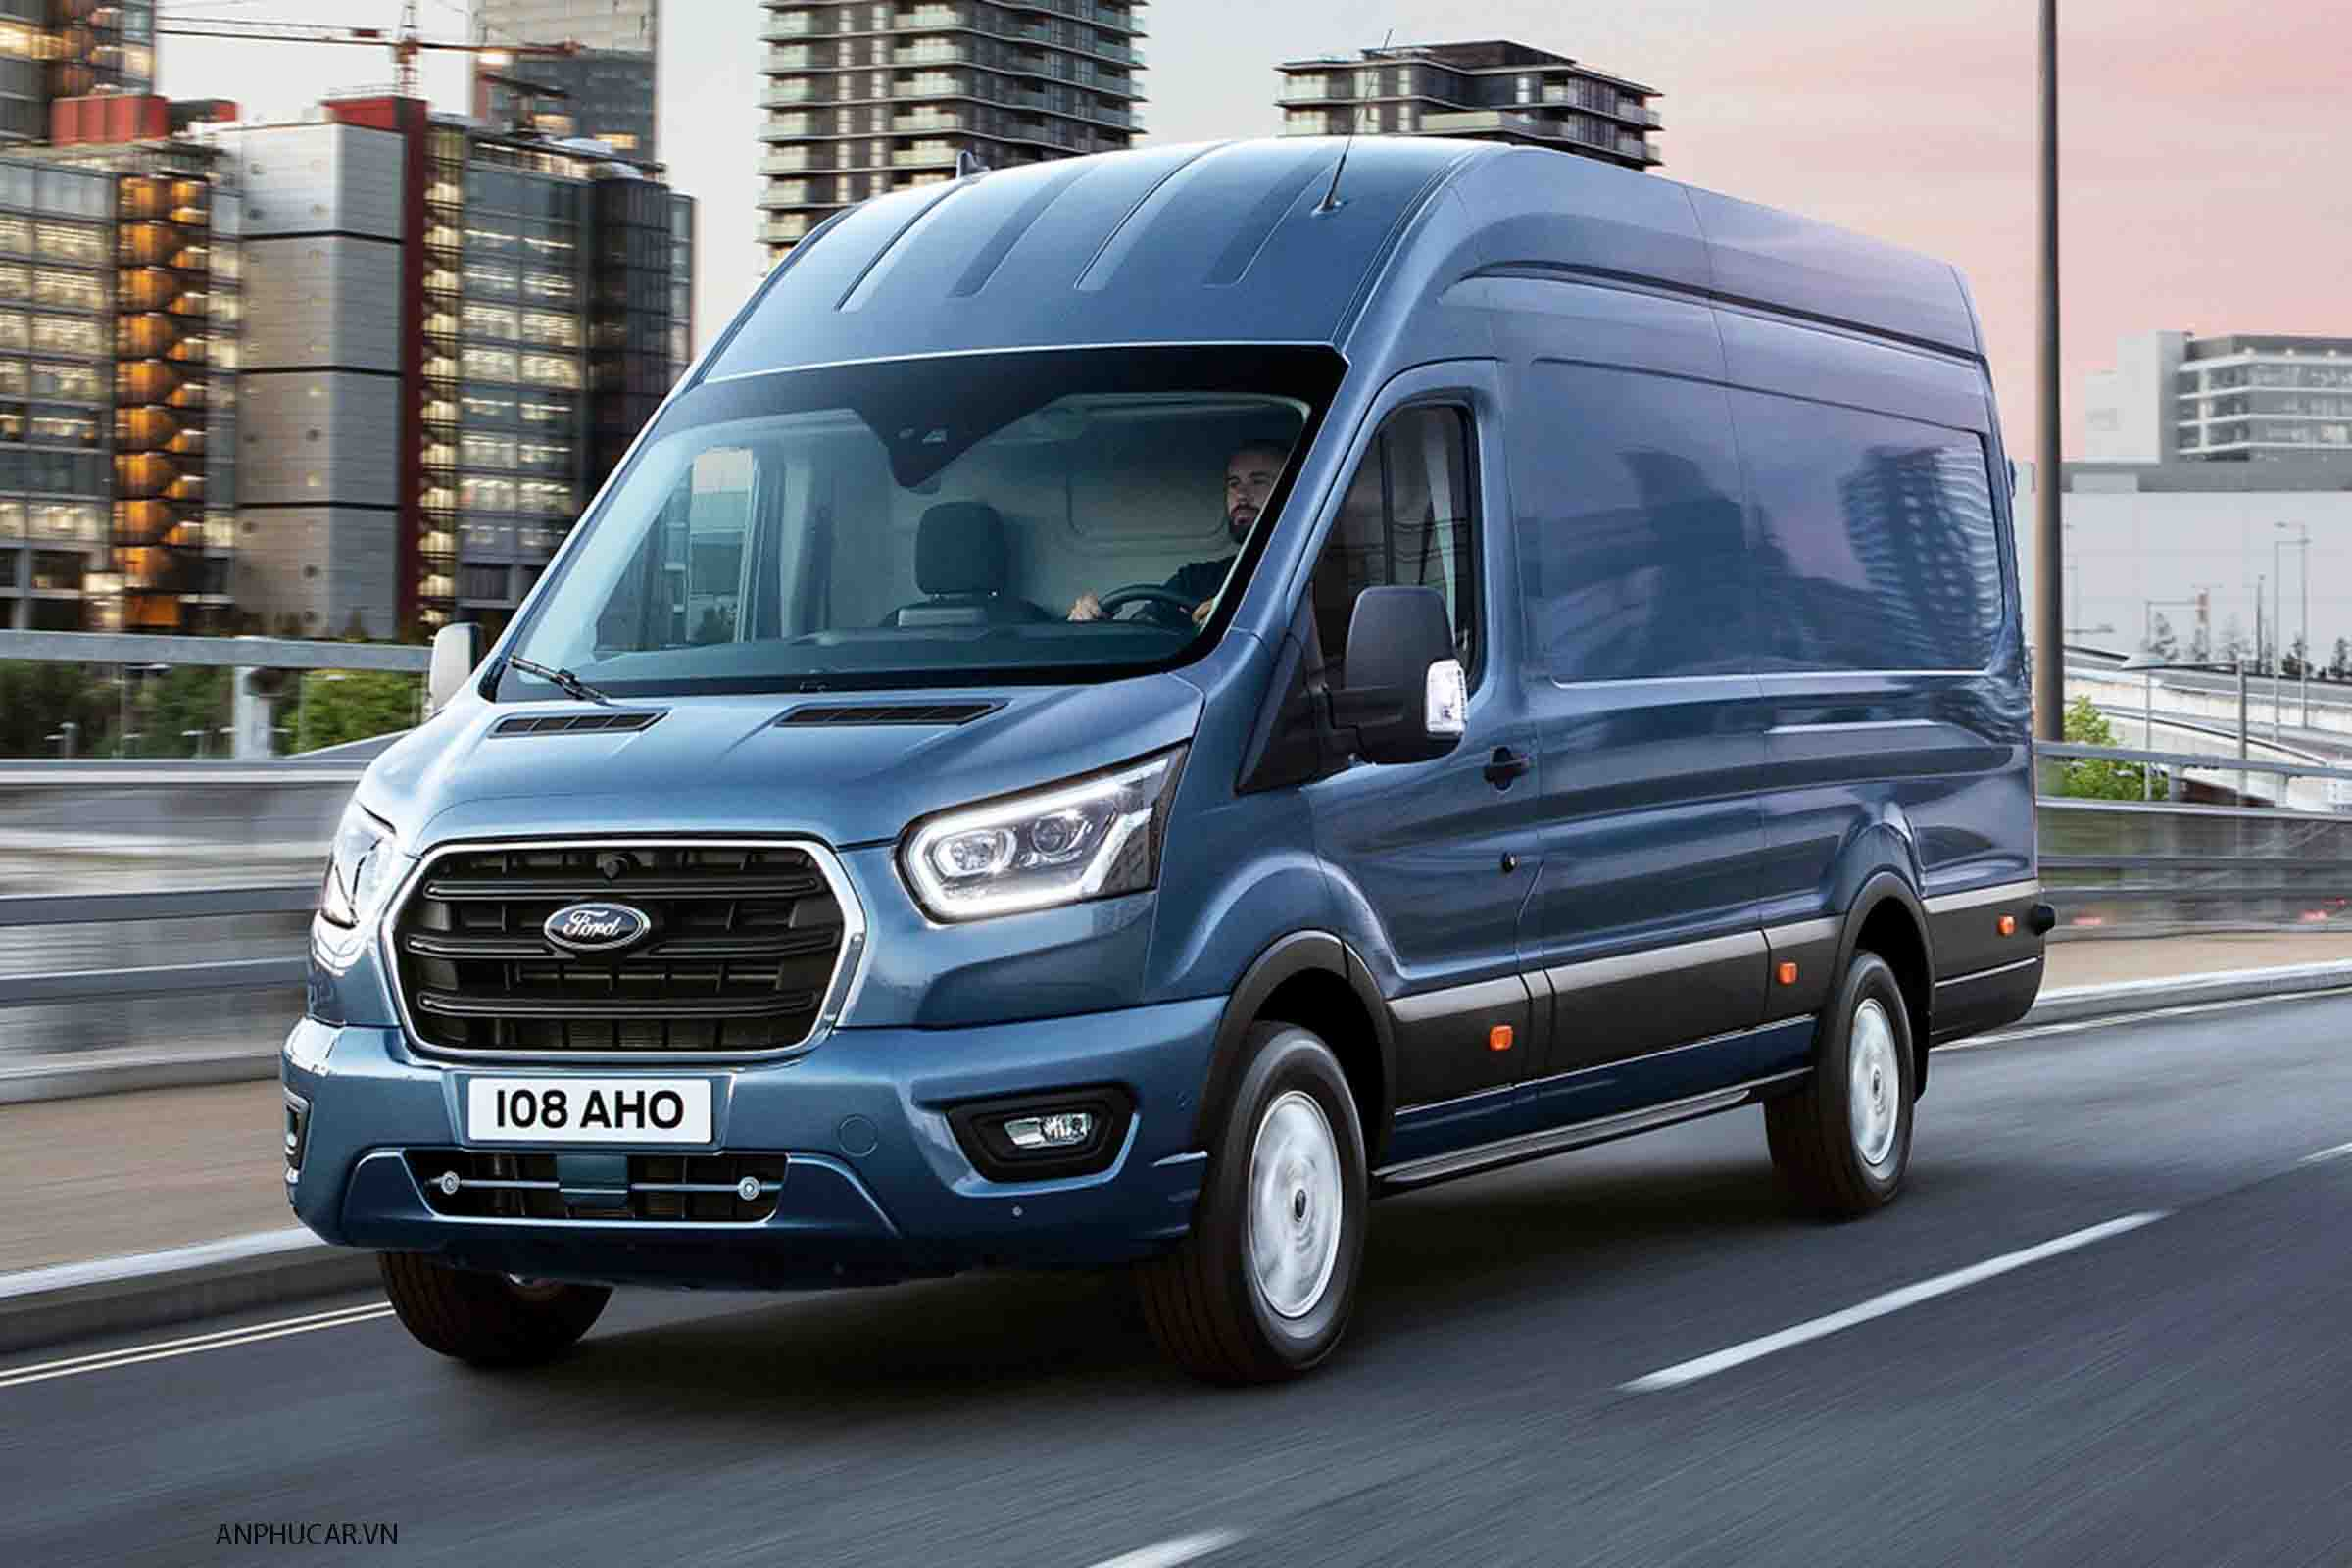 ford-transit-2020 BẢN MỚI NHẤT